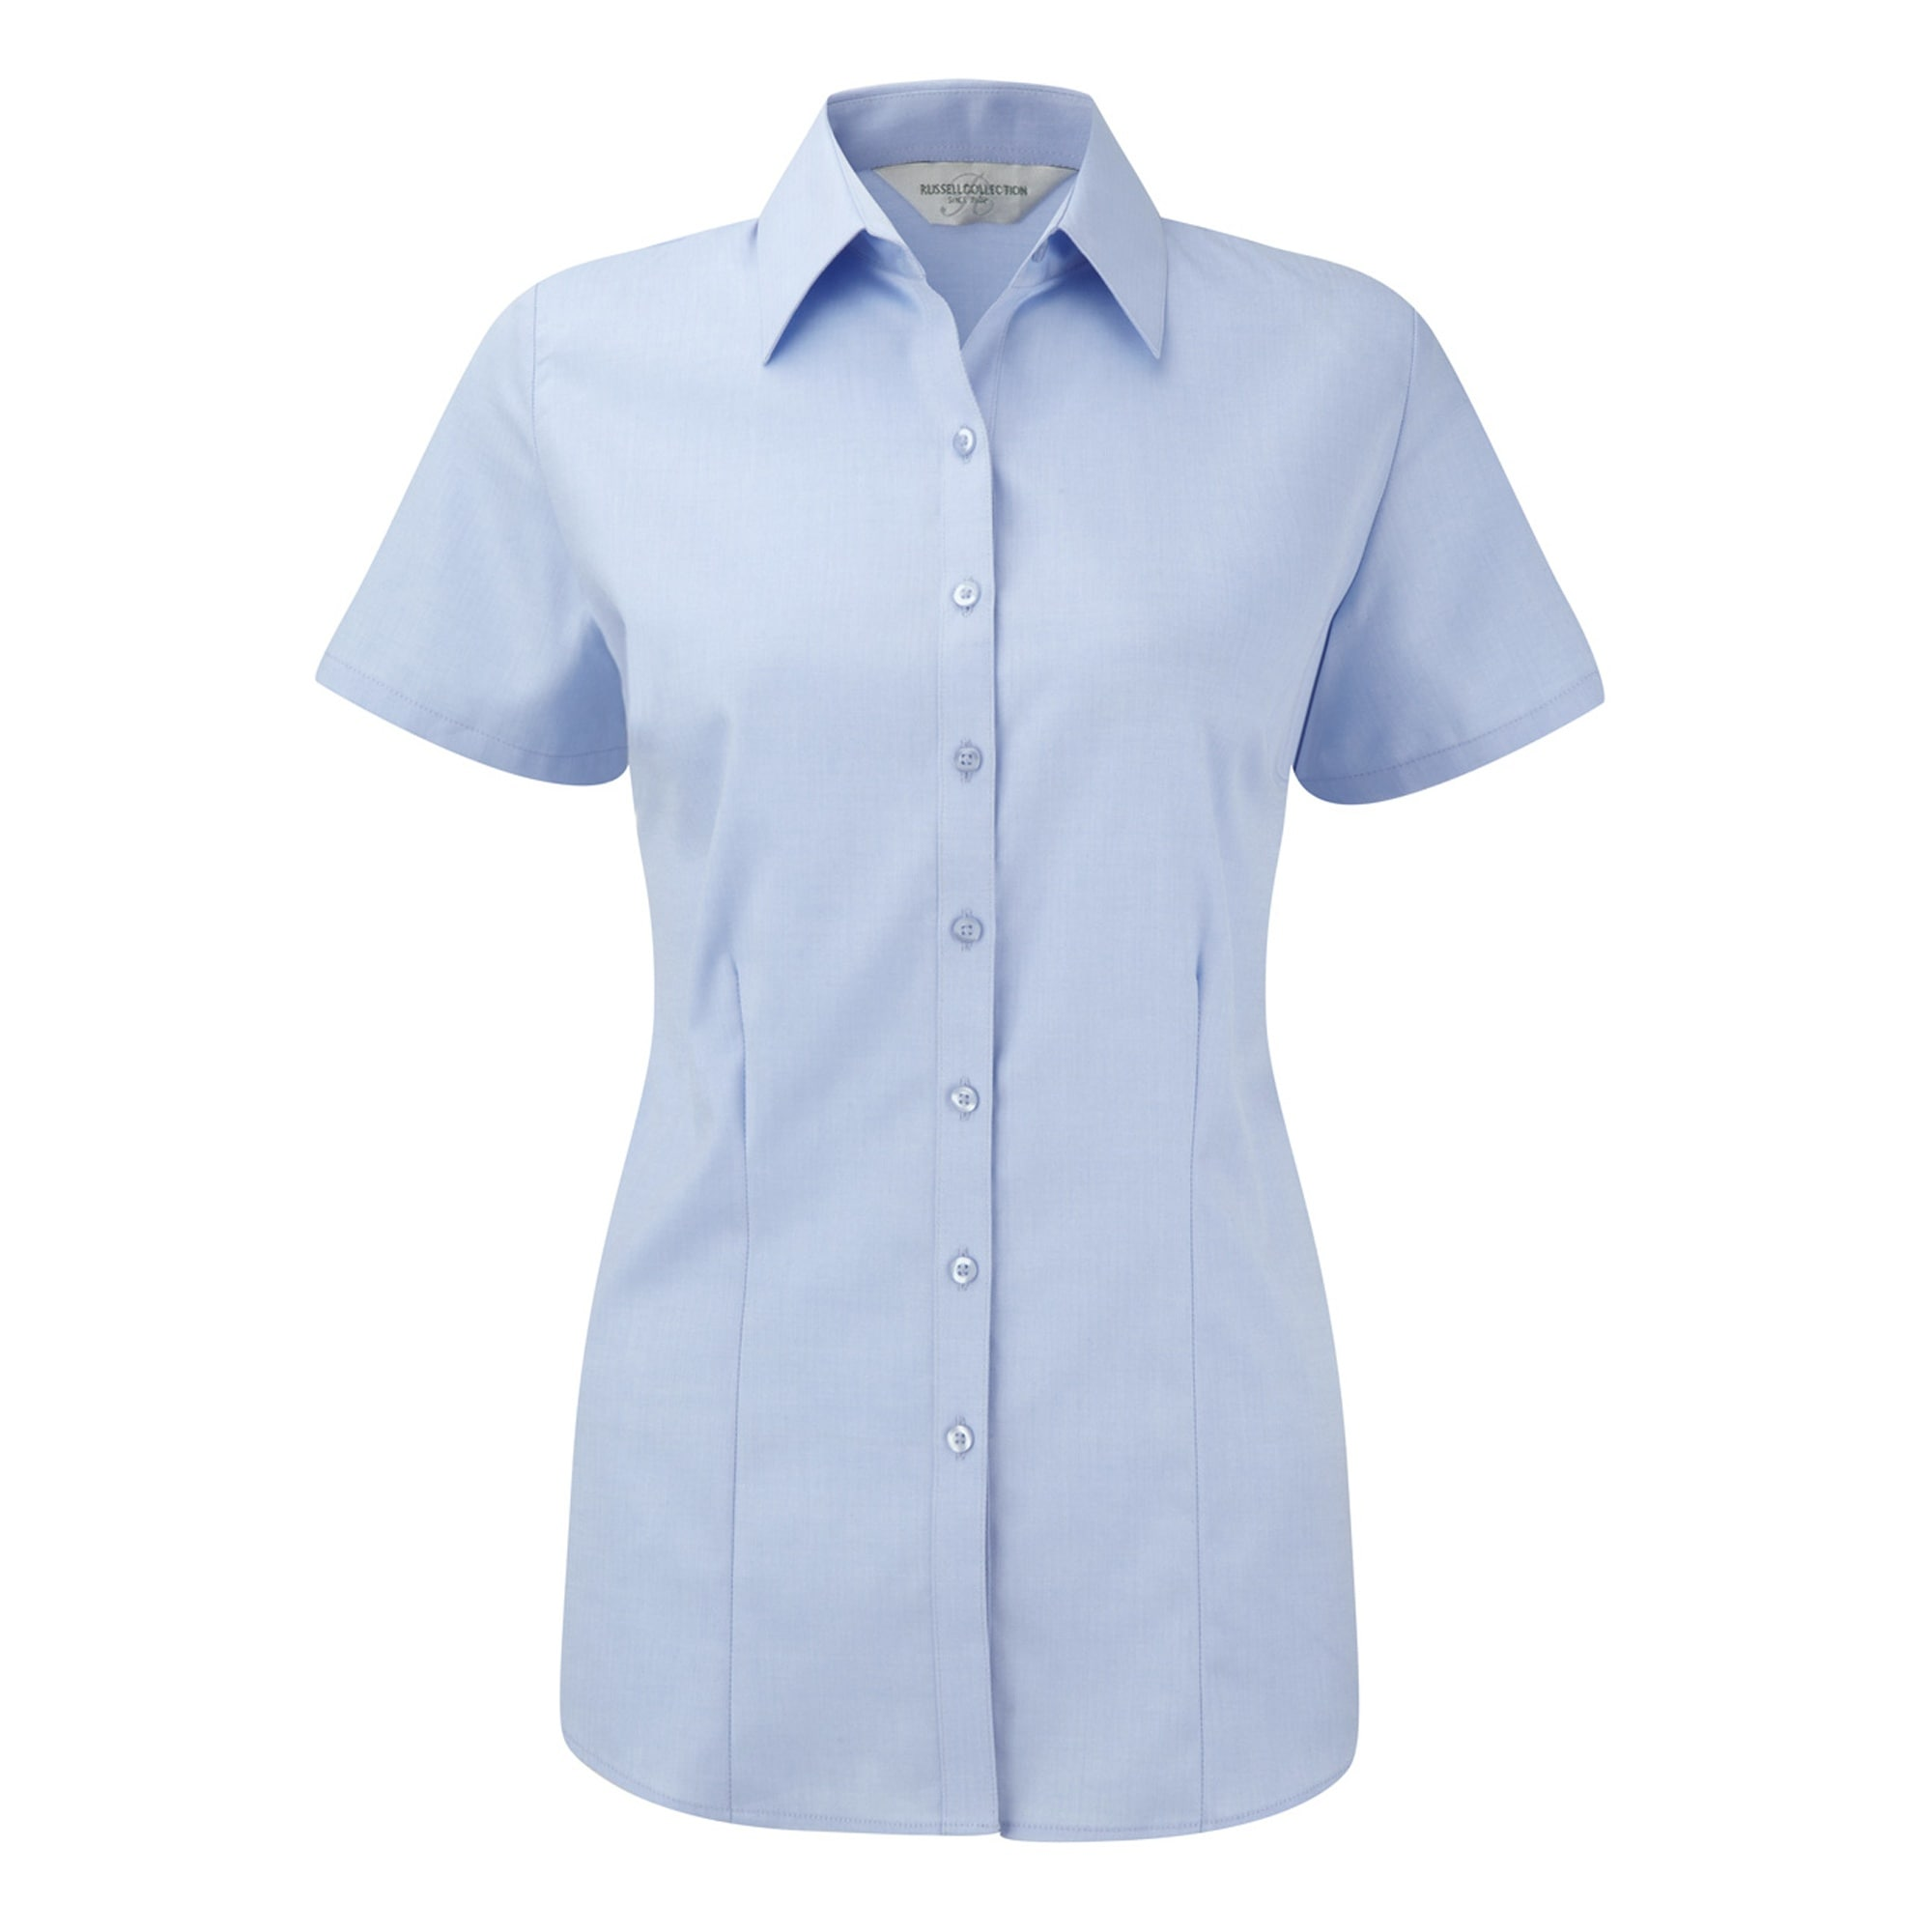 Russell Kurzarmbluse Damen Bluse / Hemd mit dezentem Fischgrätenmuster kurzärmlig